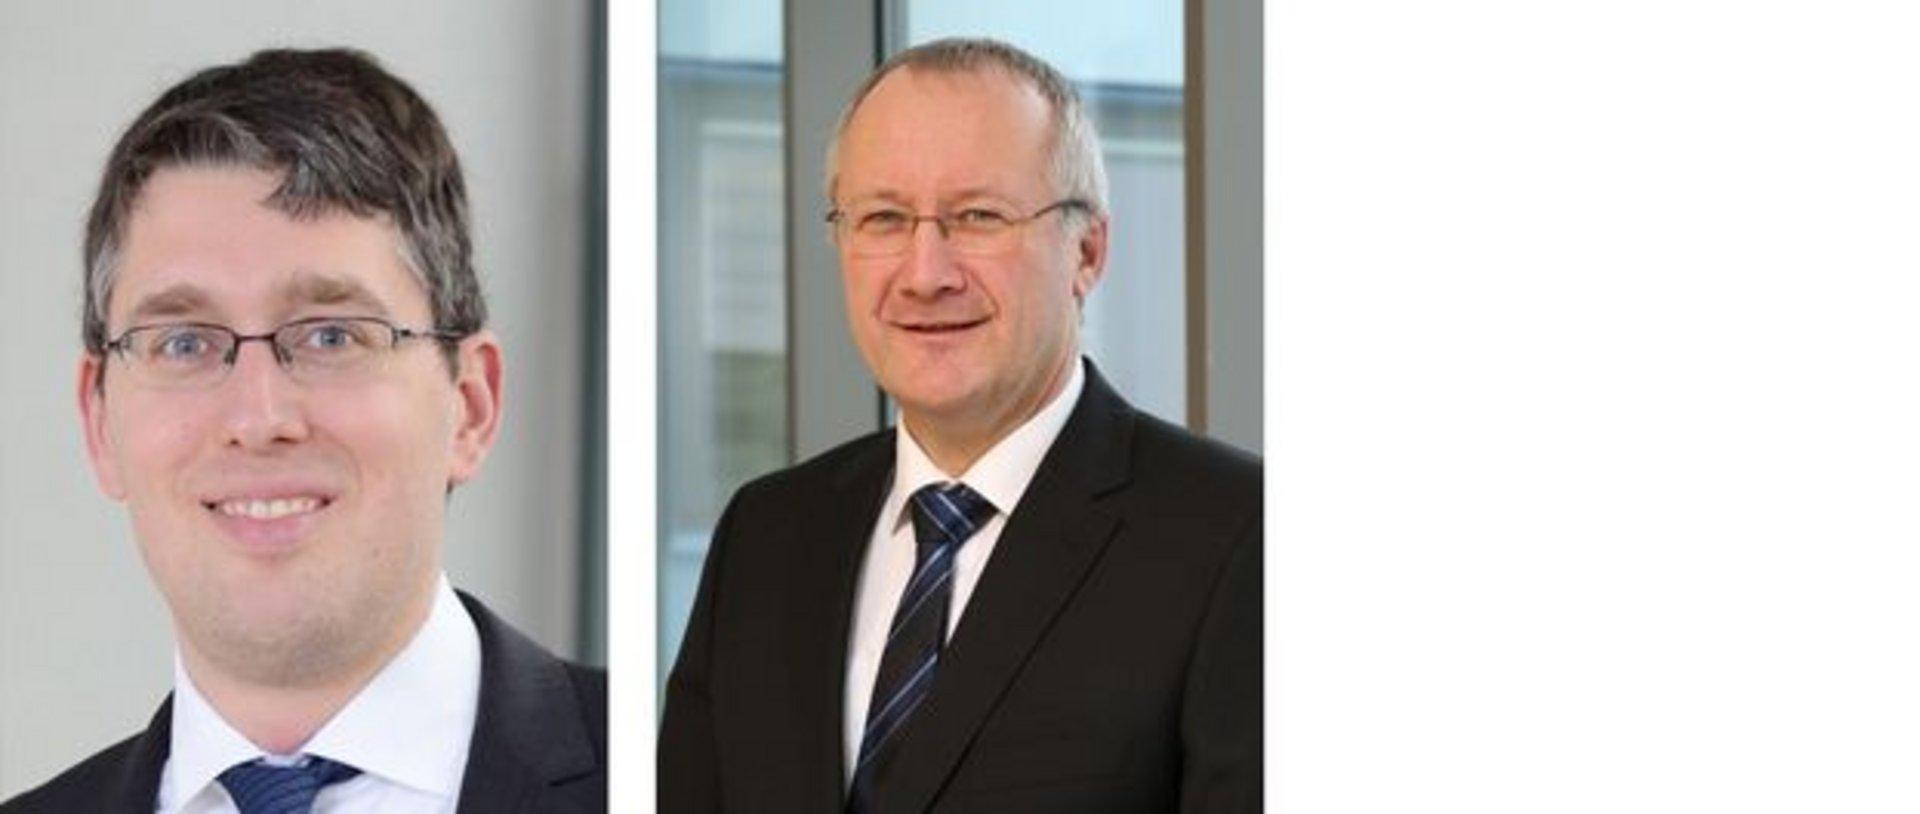 Vorstand Beisitzer Solar Cluster Baden-Württemberg